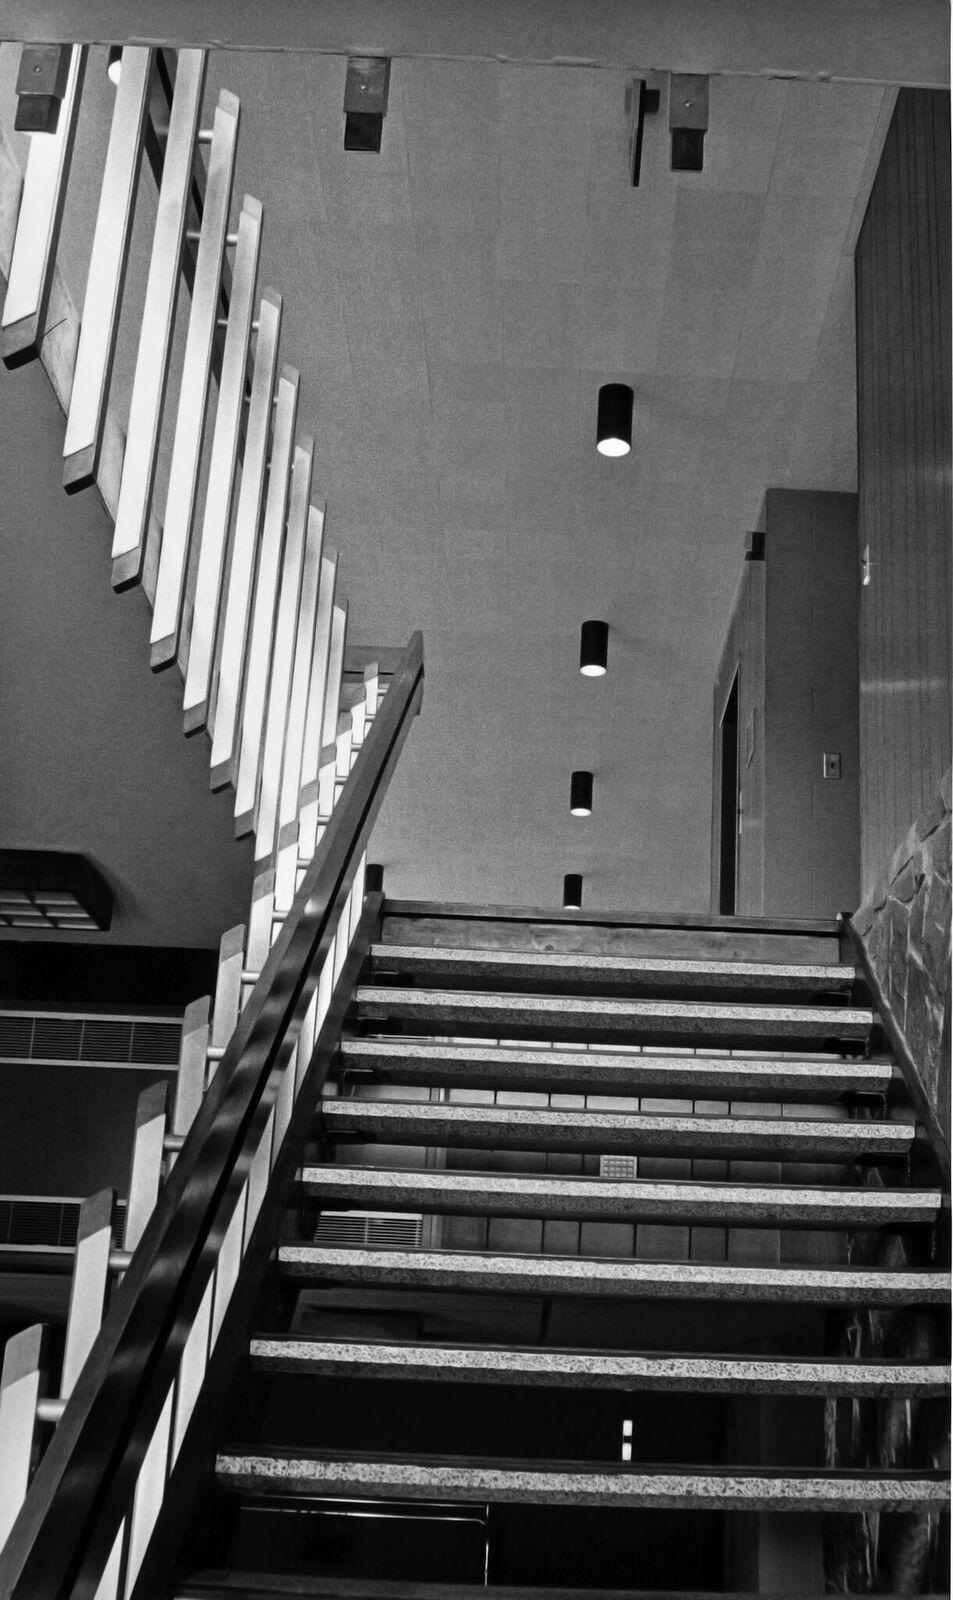 SouthPortland_Broadway_482_PublicLibary_1960s_Back_Stair_CHRISTOPHER_GRASSE.jpg